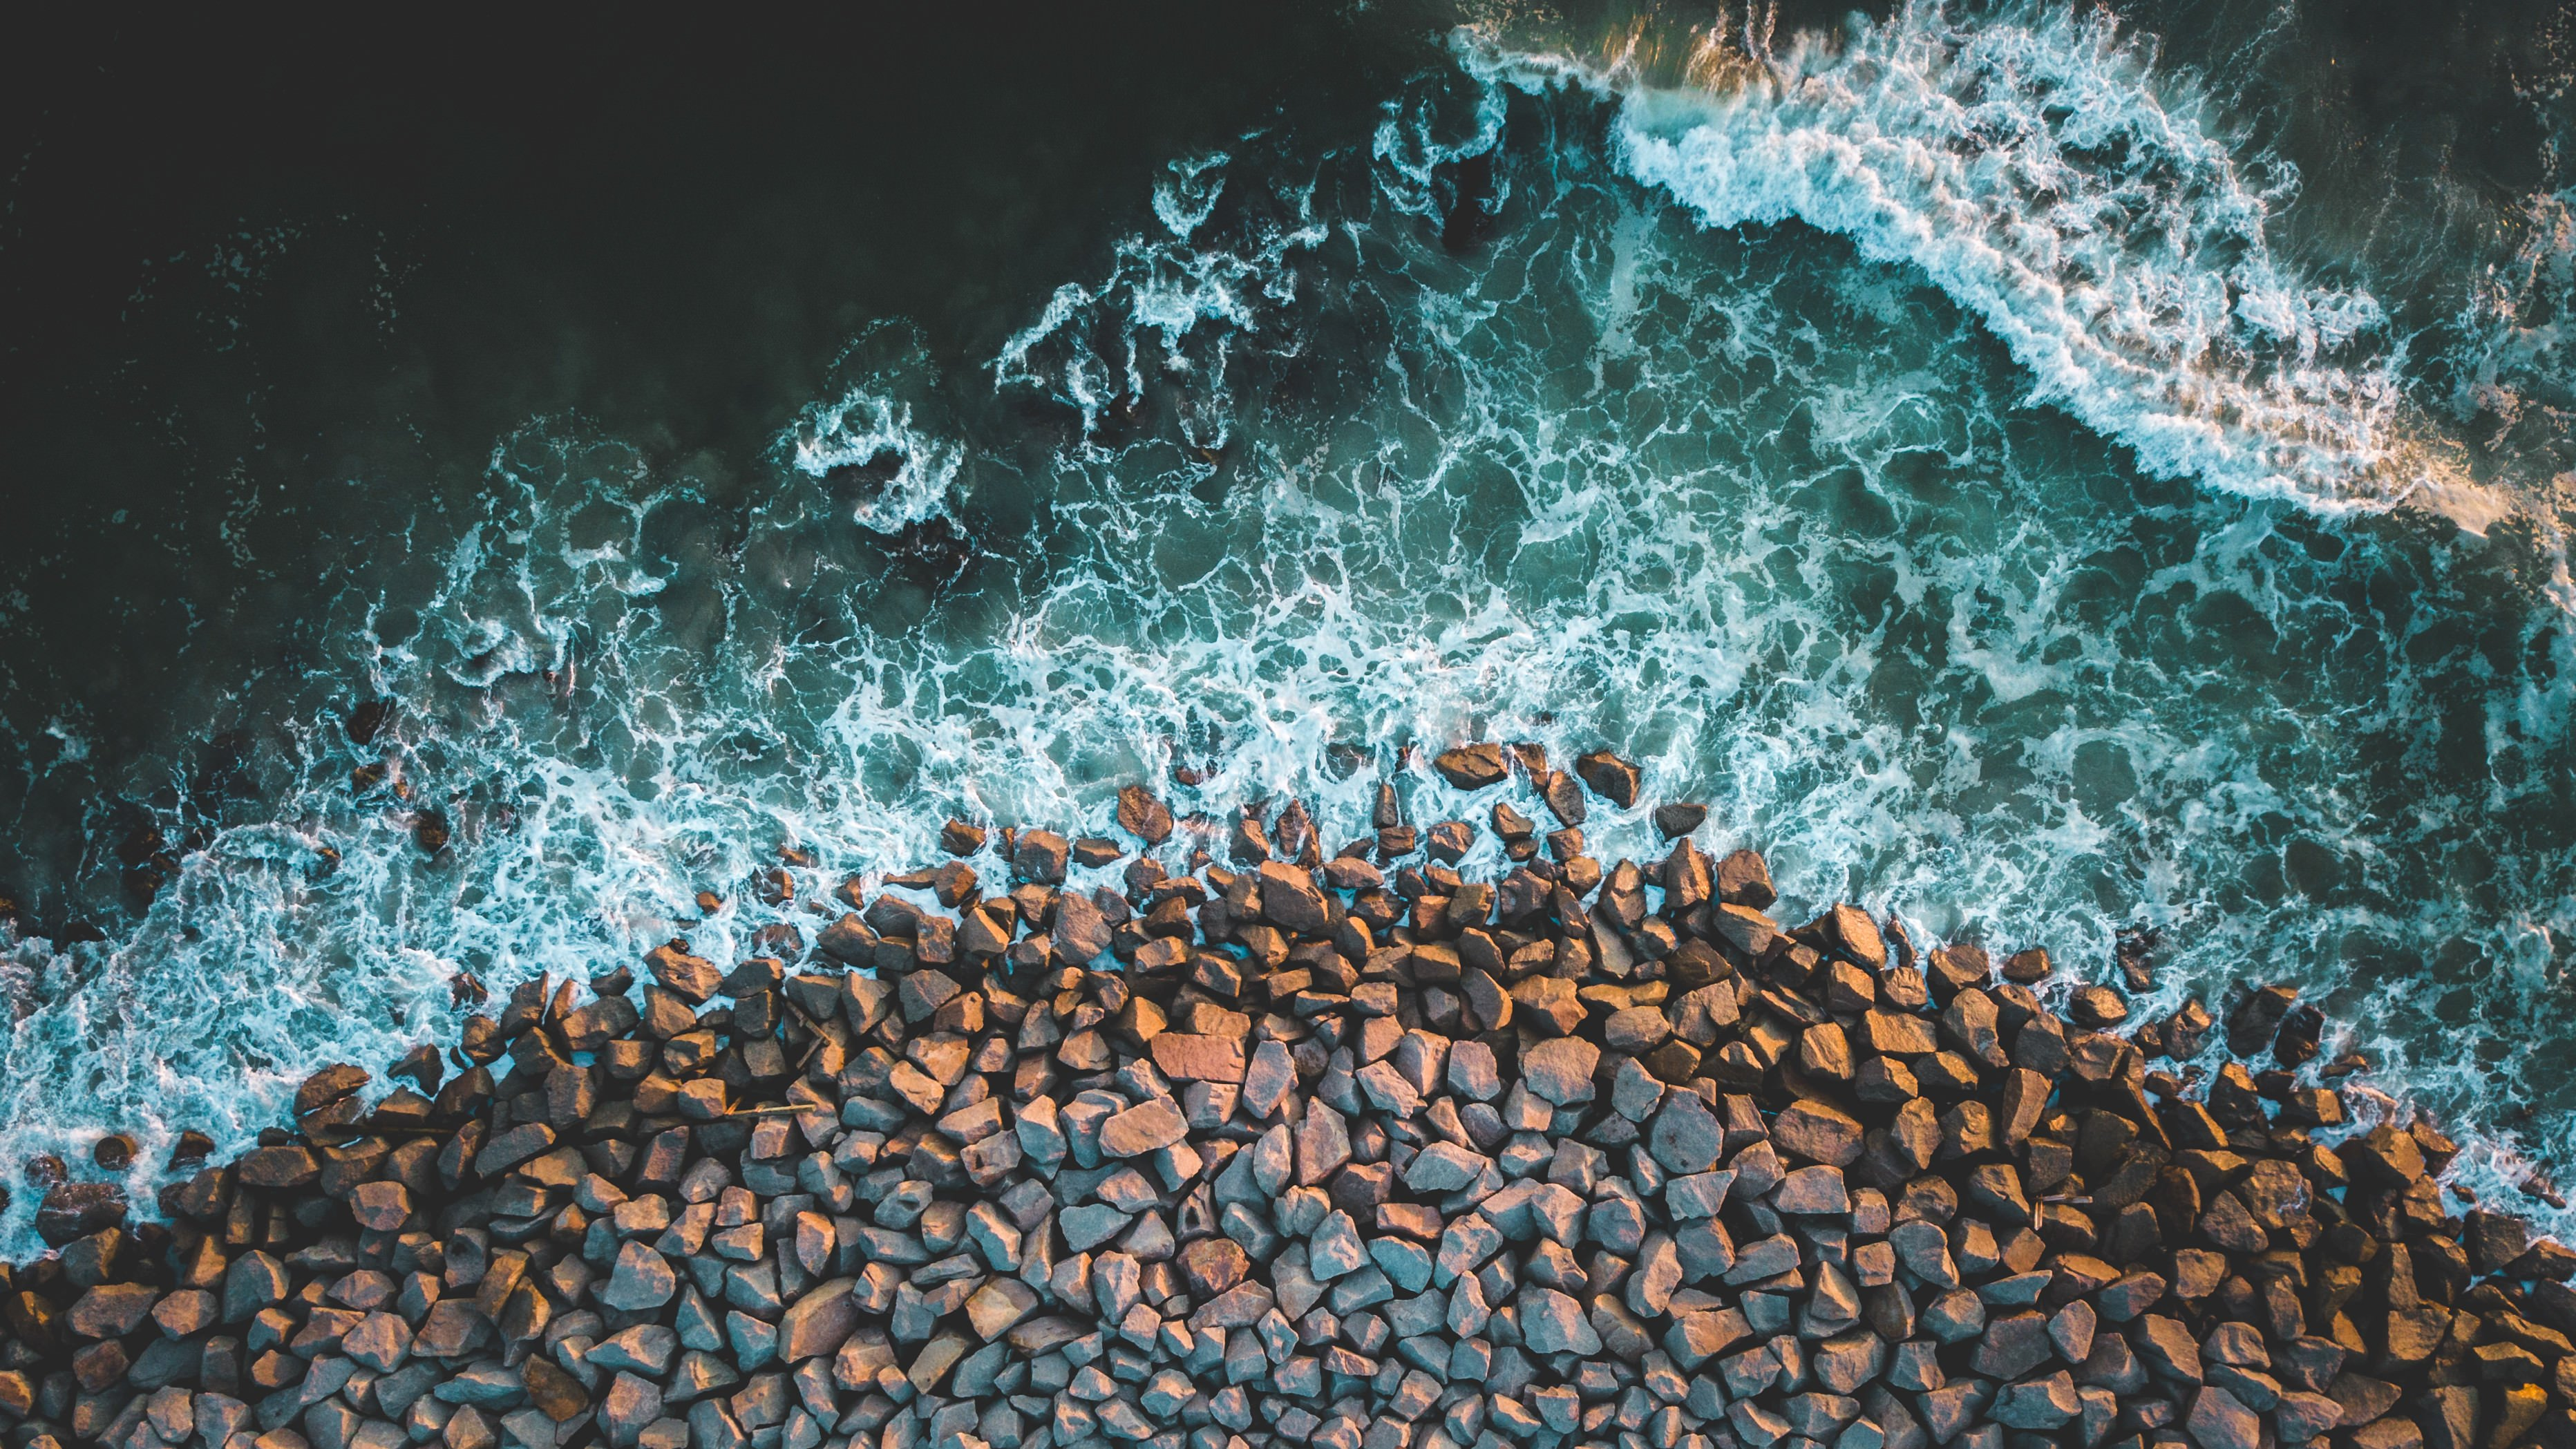 Wallpaper Rocky Beach Desktop Wallpapers: Rocky Wallpapers 4k For Your Phone And Desktop Screen